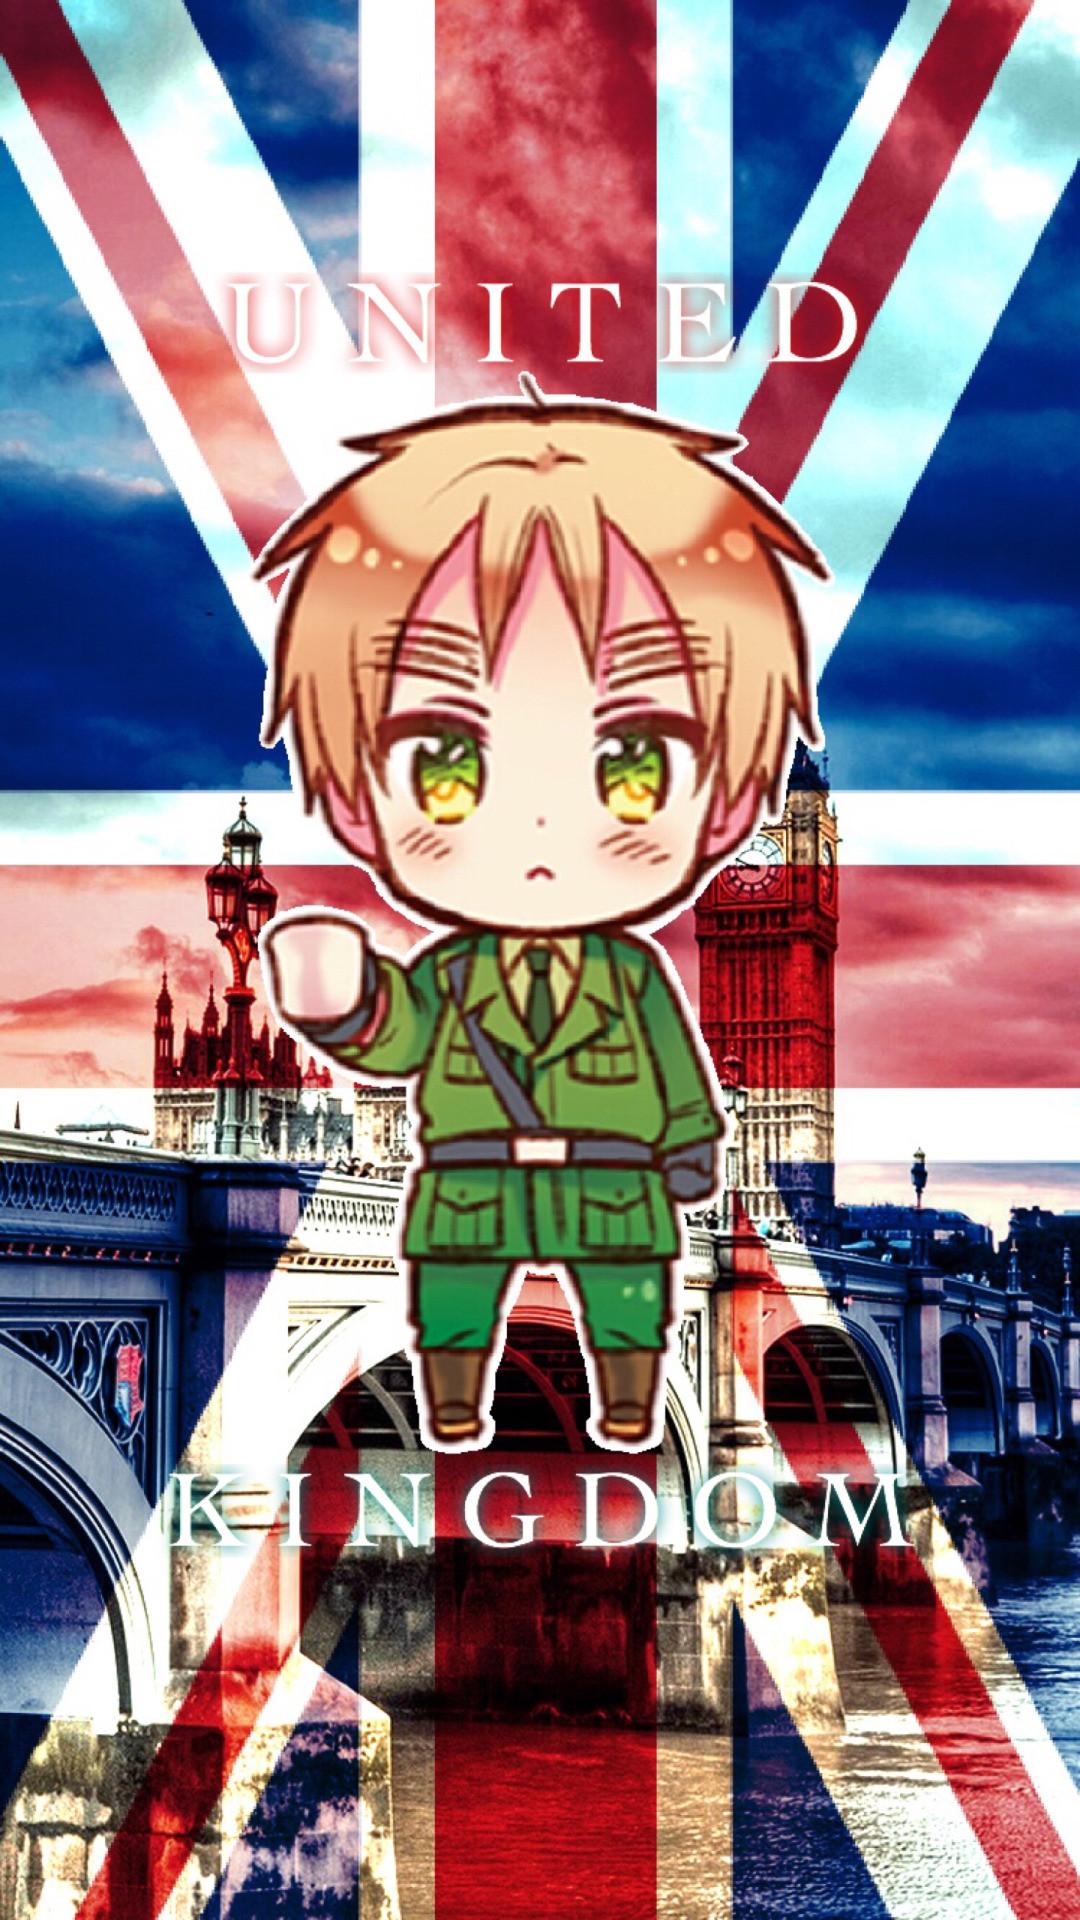 Iphone Wallpapers, Hetalia, Anime, Search, Russia, England, America, Canada